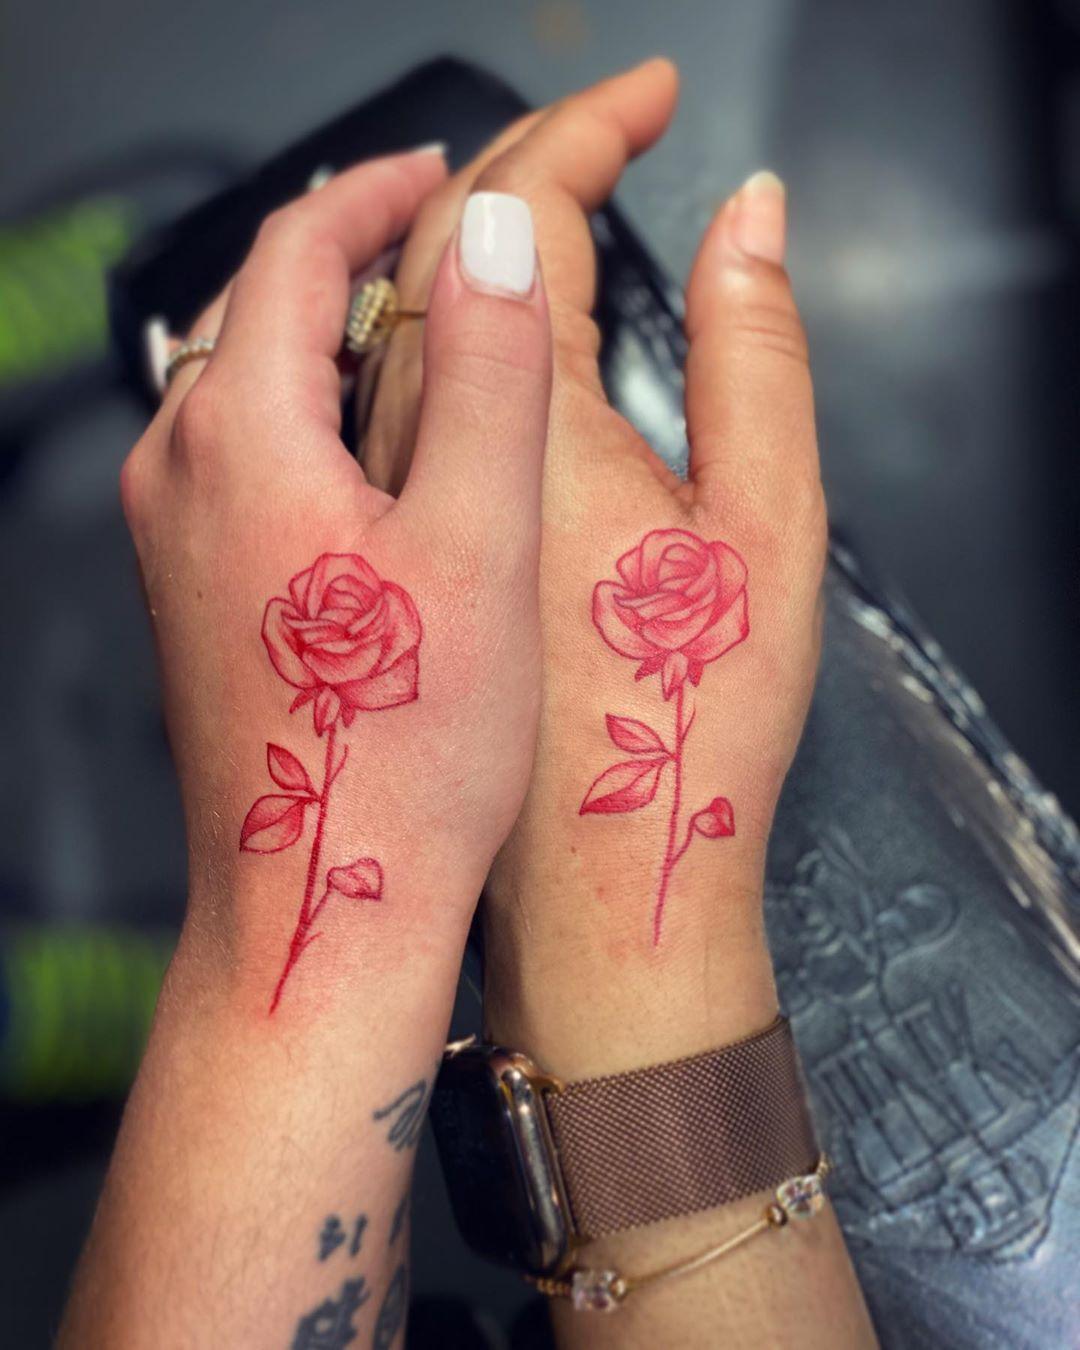 Inkk By Jv On Instagram Bestfriends Forever Inkkbyjv Atltattoo Atlantatattoo Atltatttooa In 2020 Minnie Tattoo Tattoos Black Girls With Tattoos